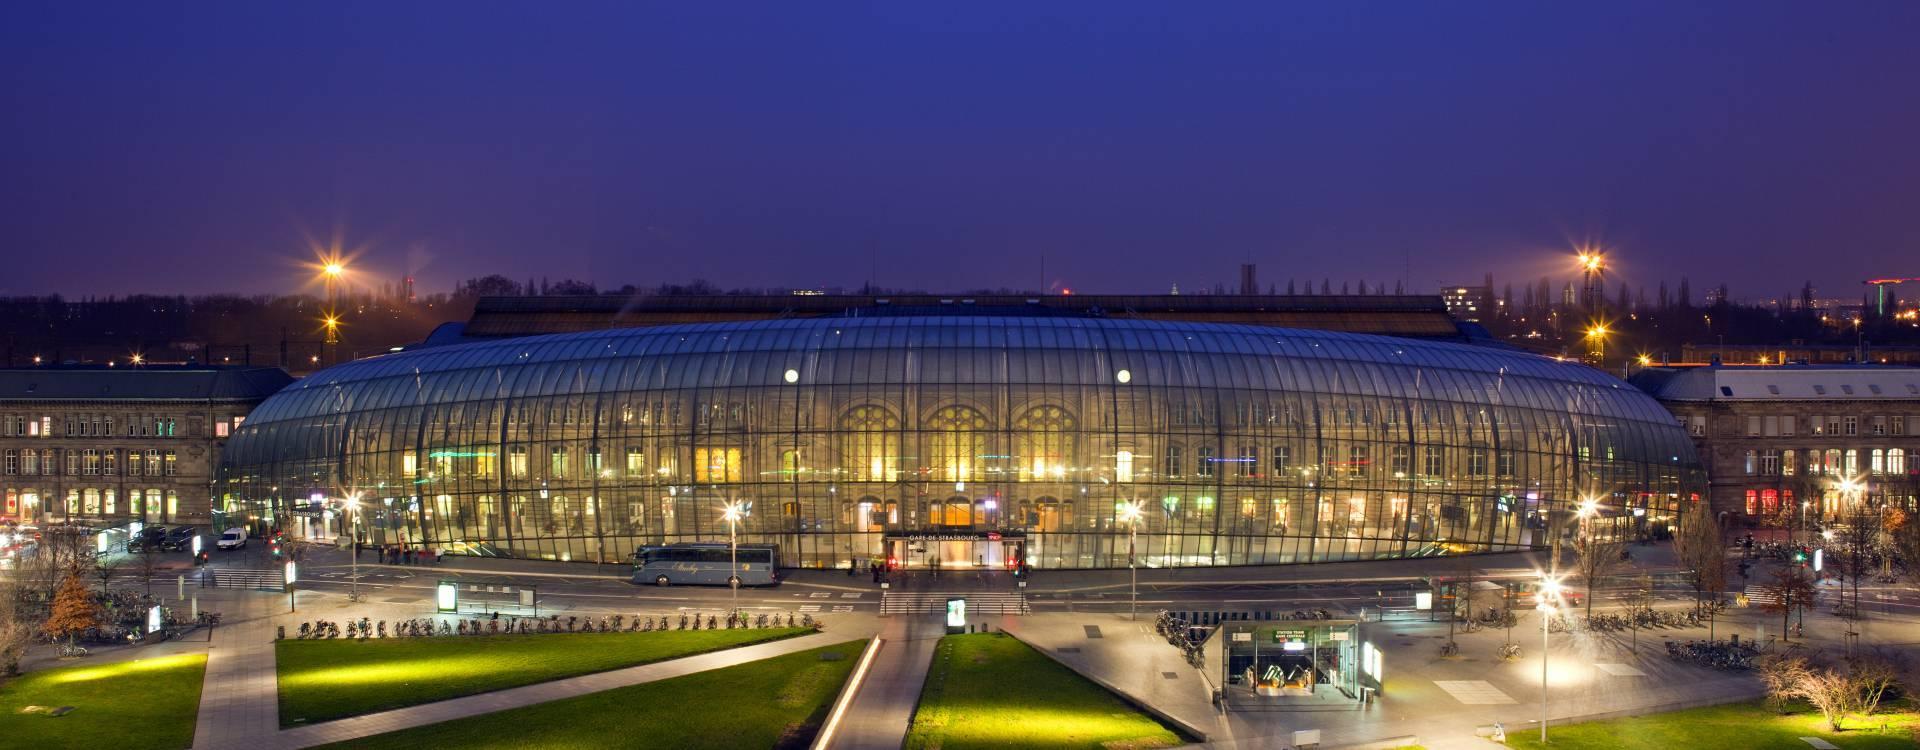 Gare SNCF de Strasbourg